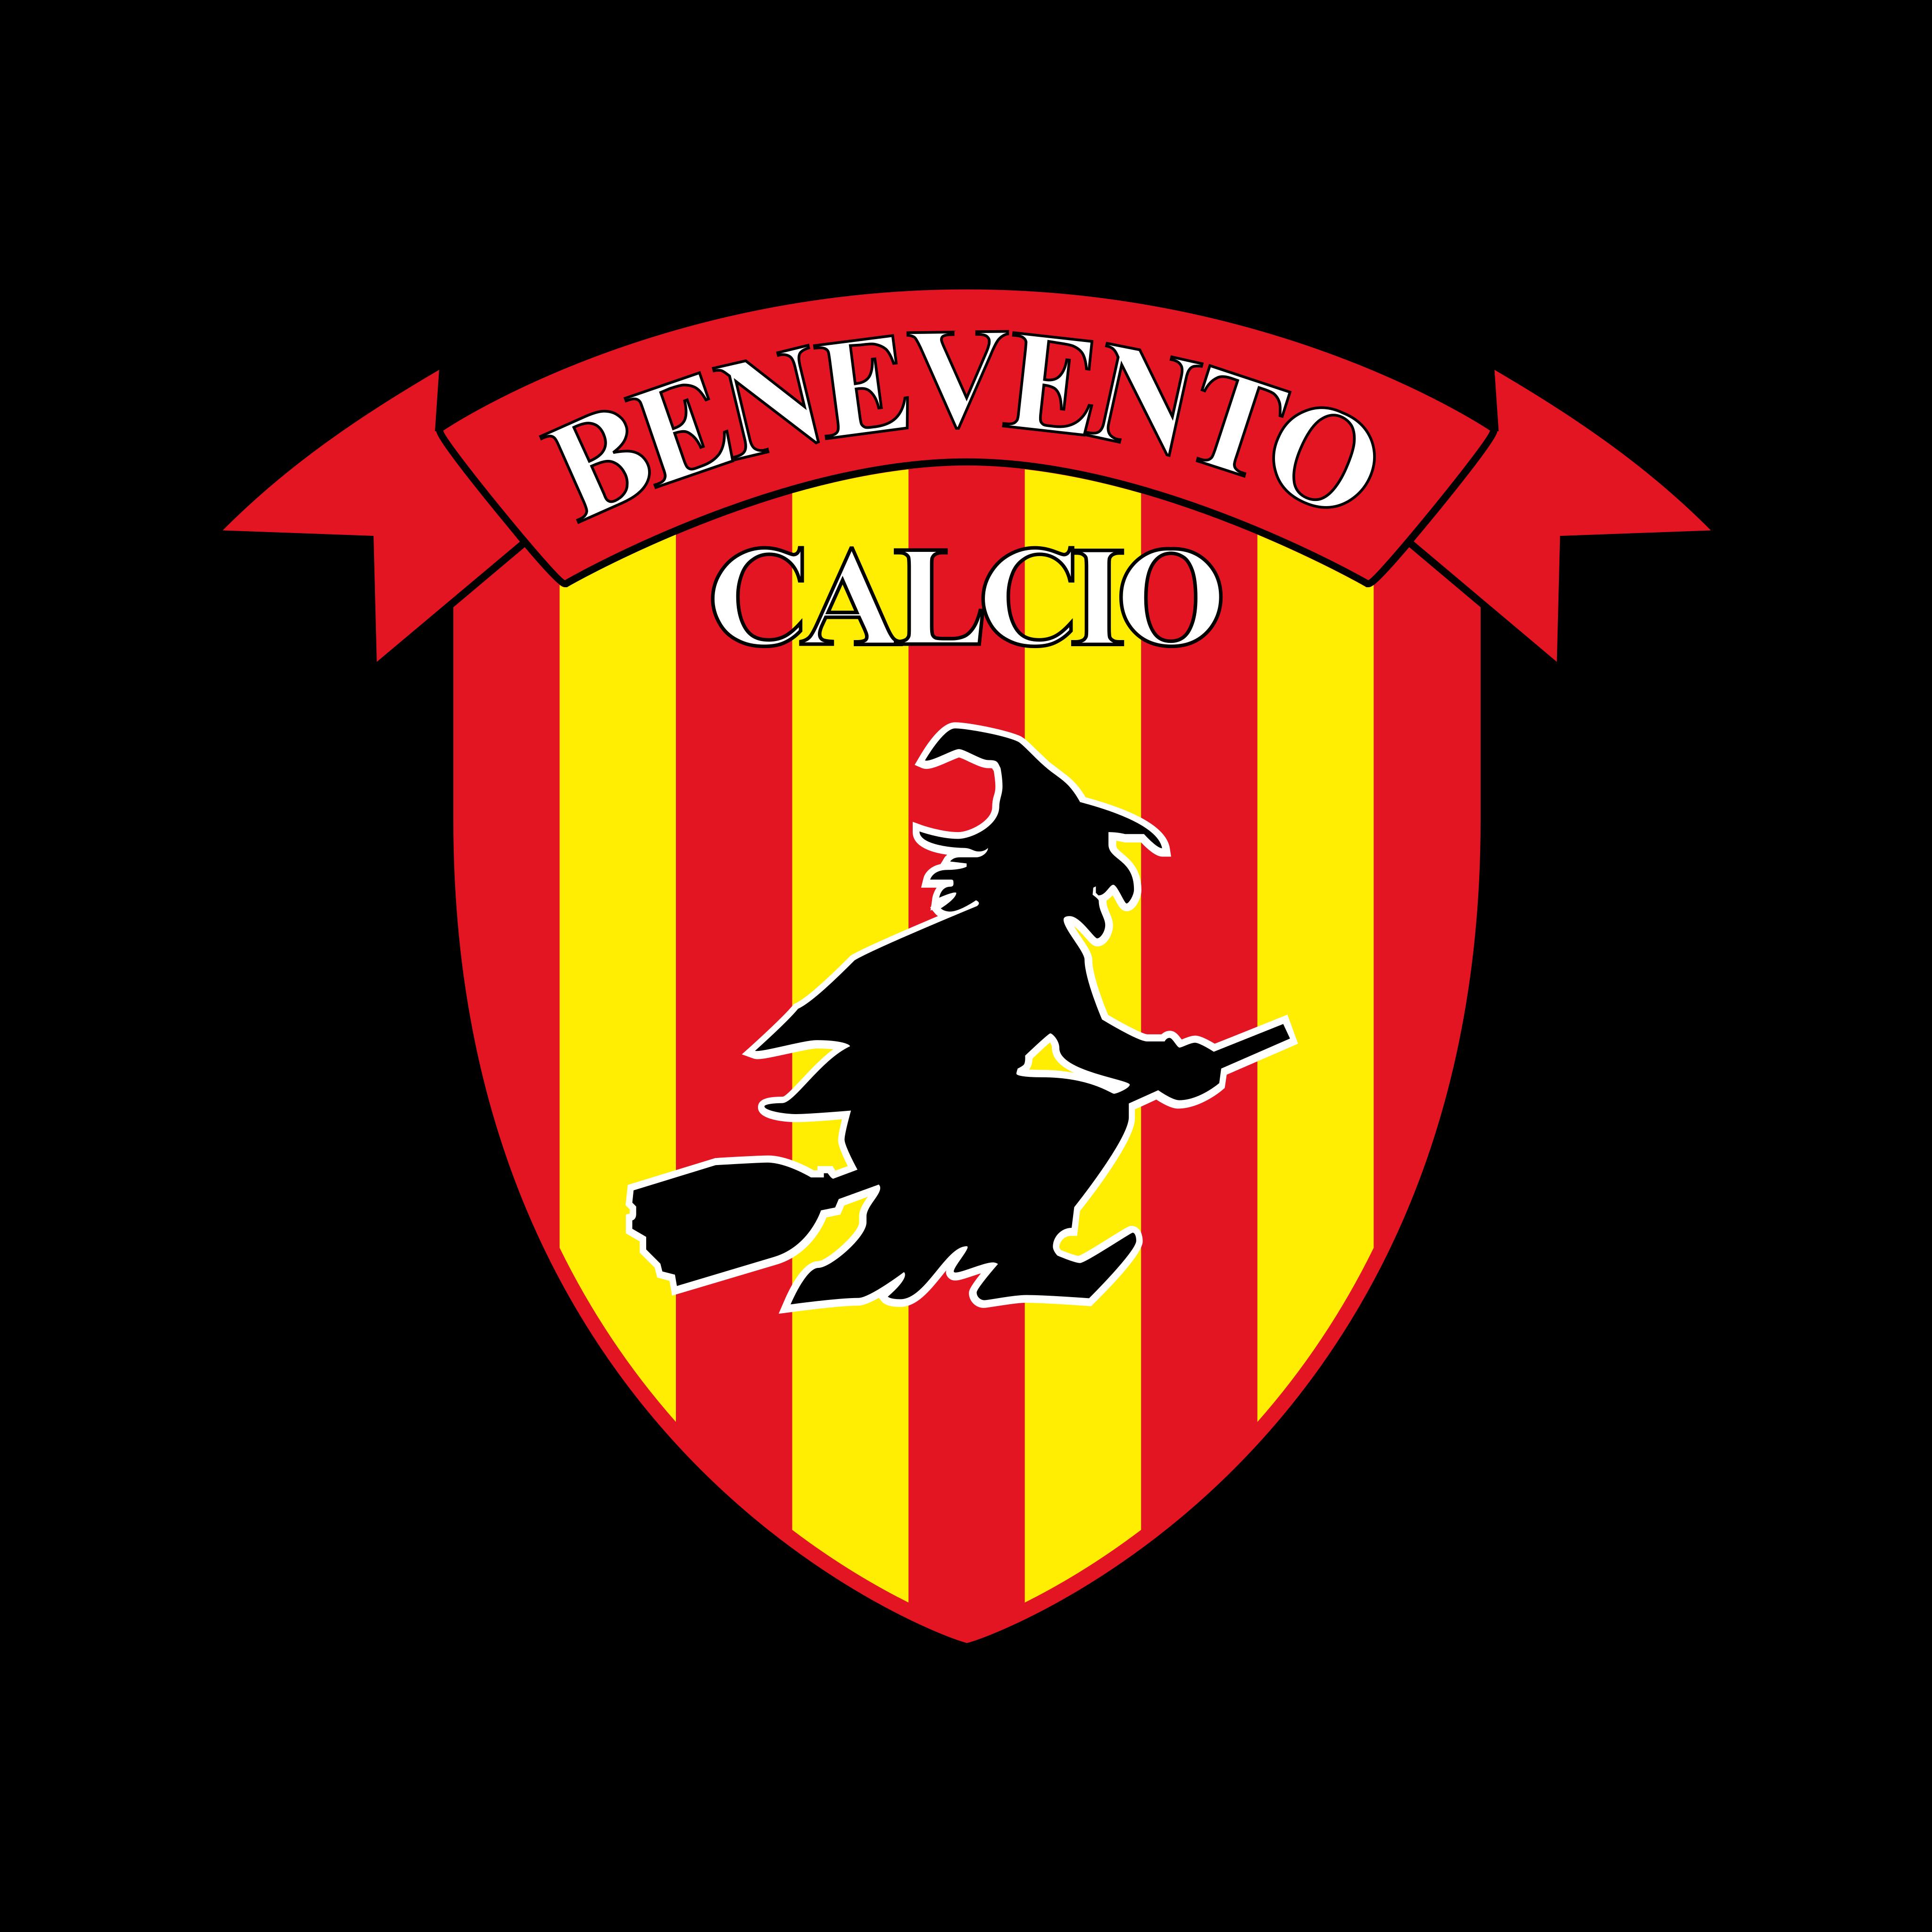 benevento calcio logo 0 - Benevento Calcio Logo